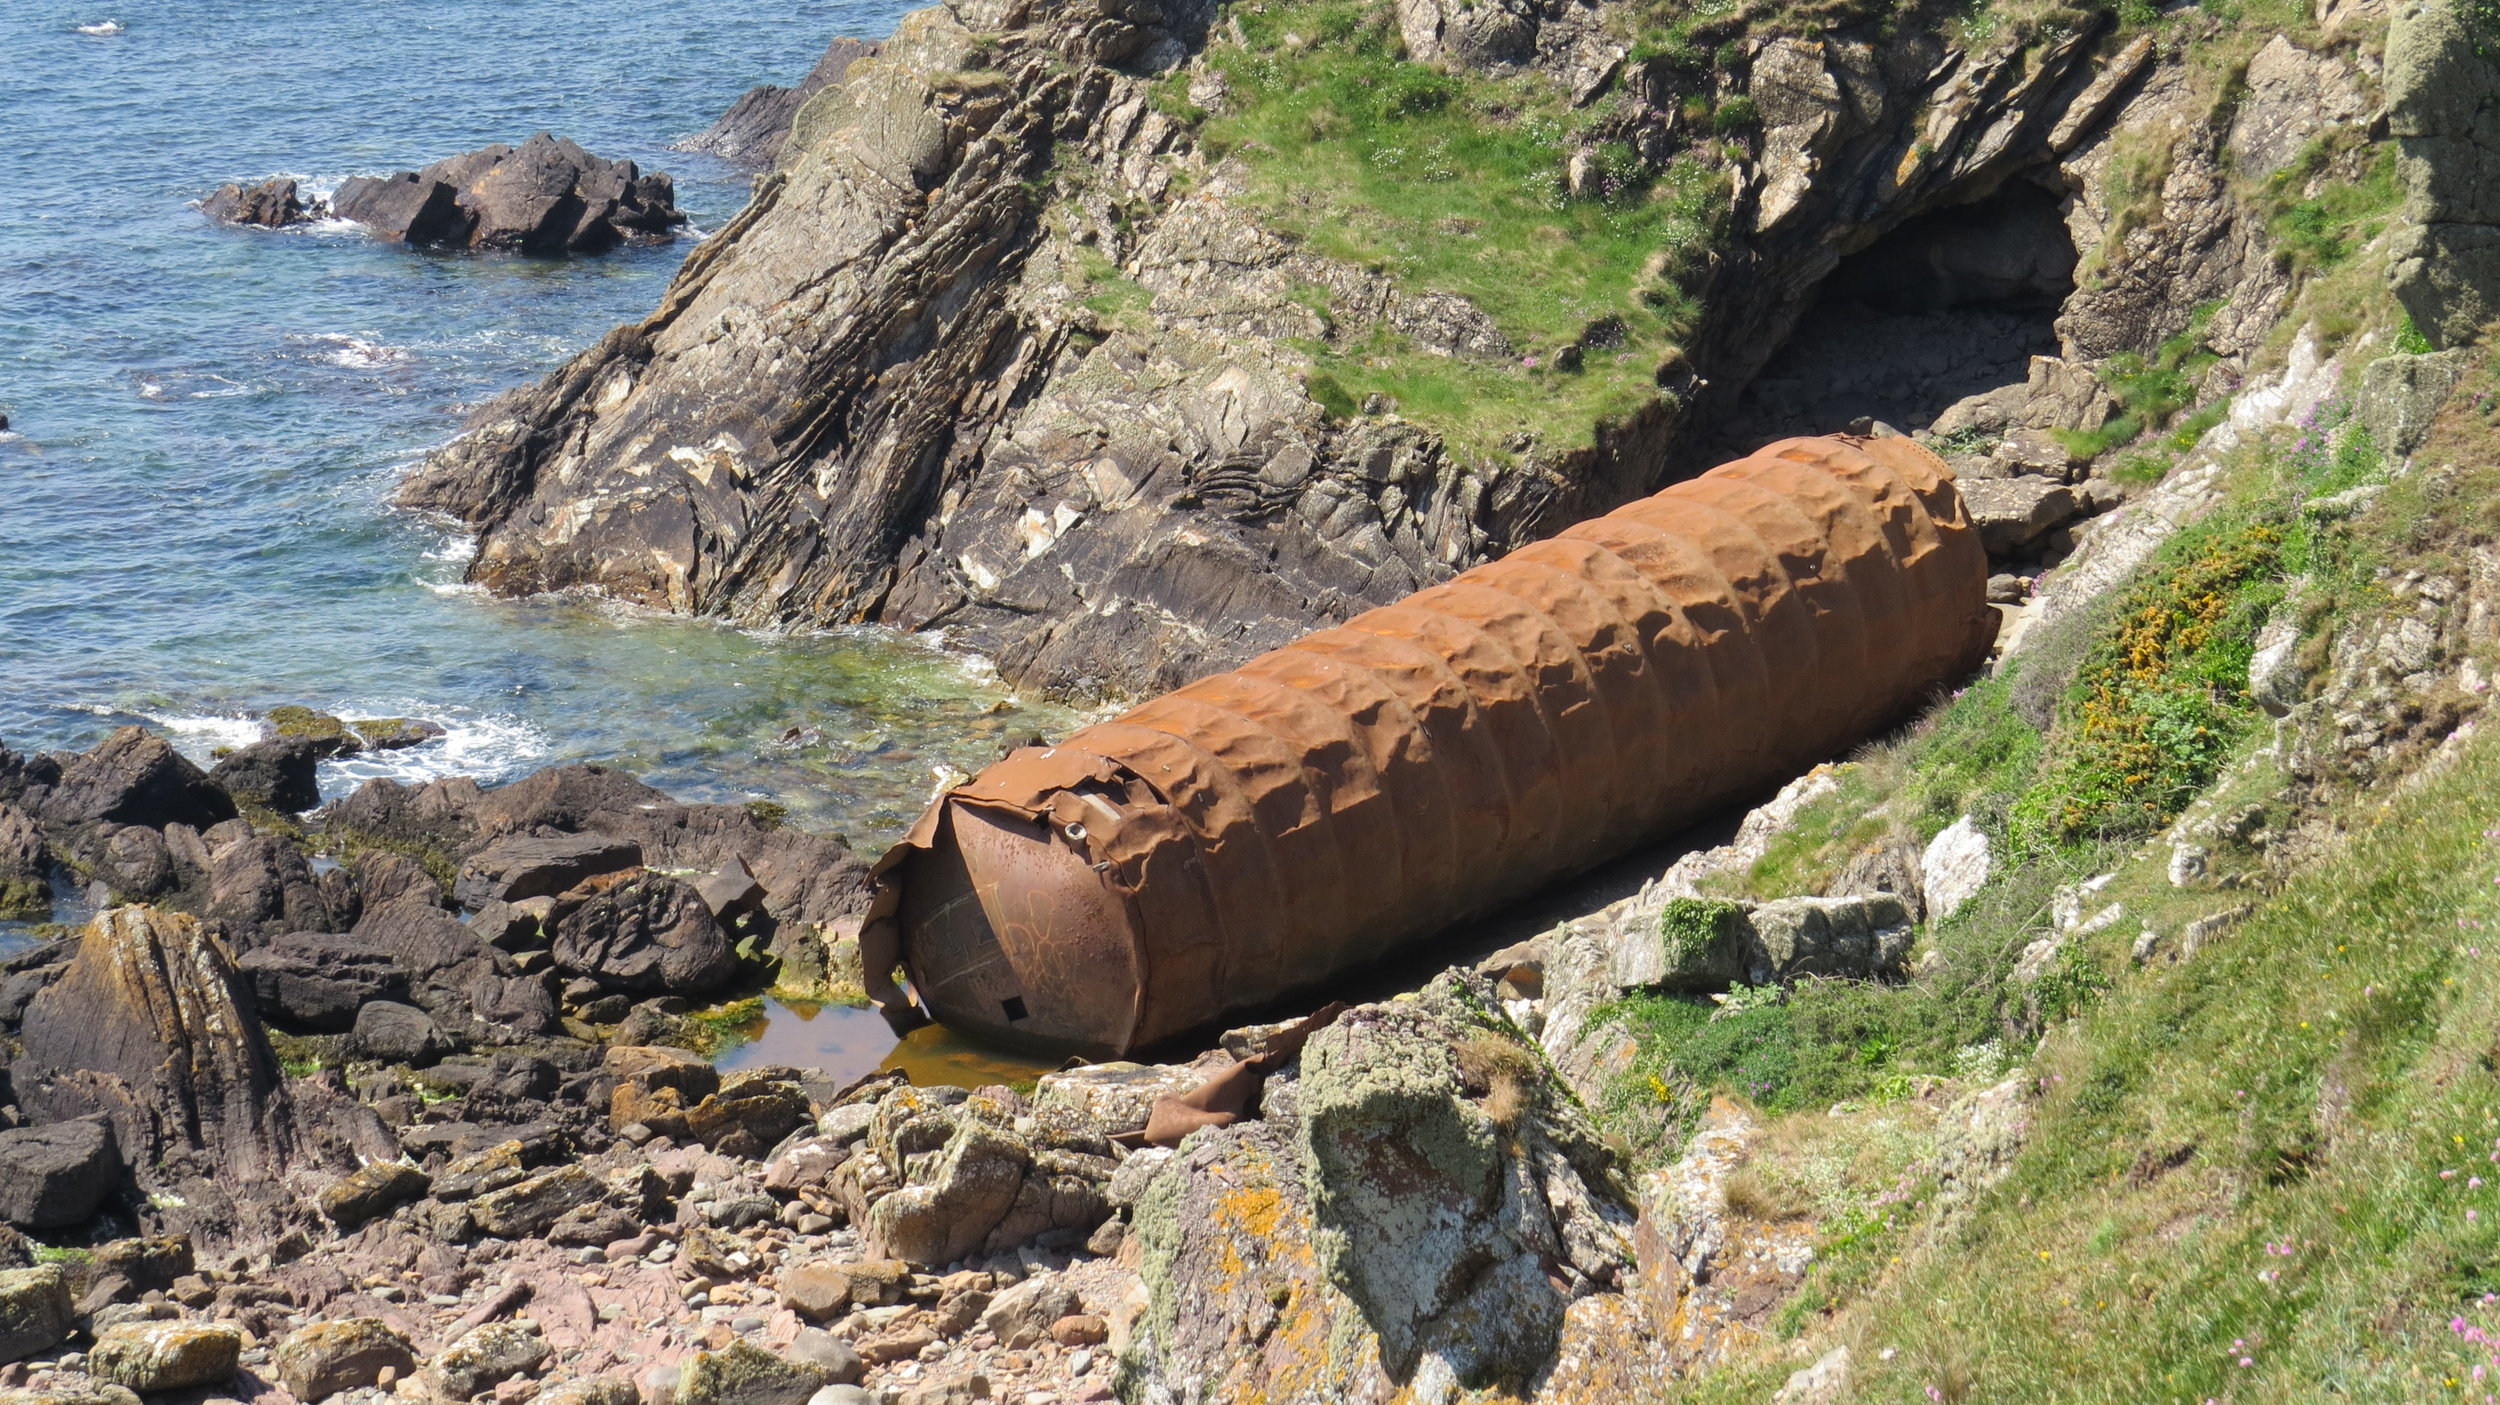 52 Ton Gas Cylinder washed up